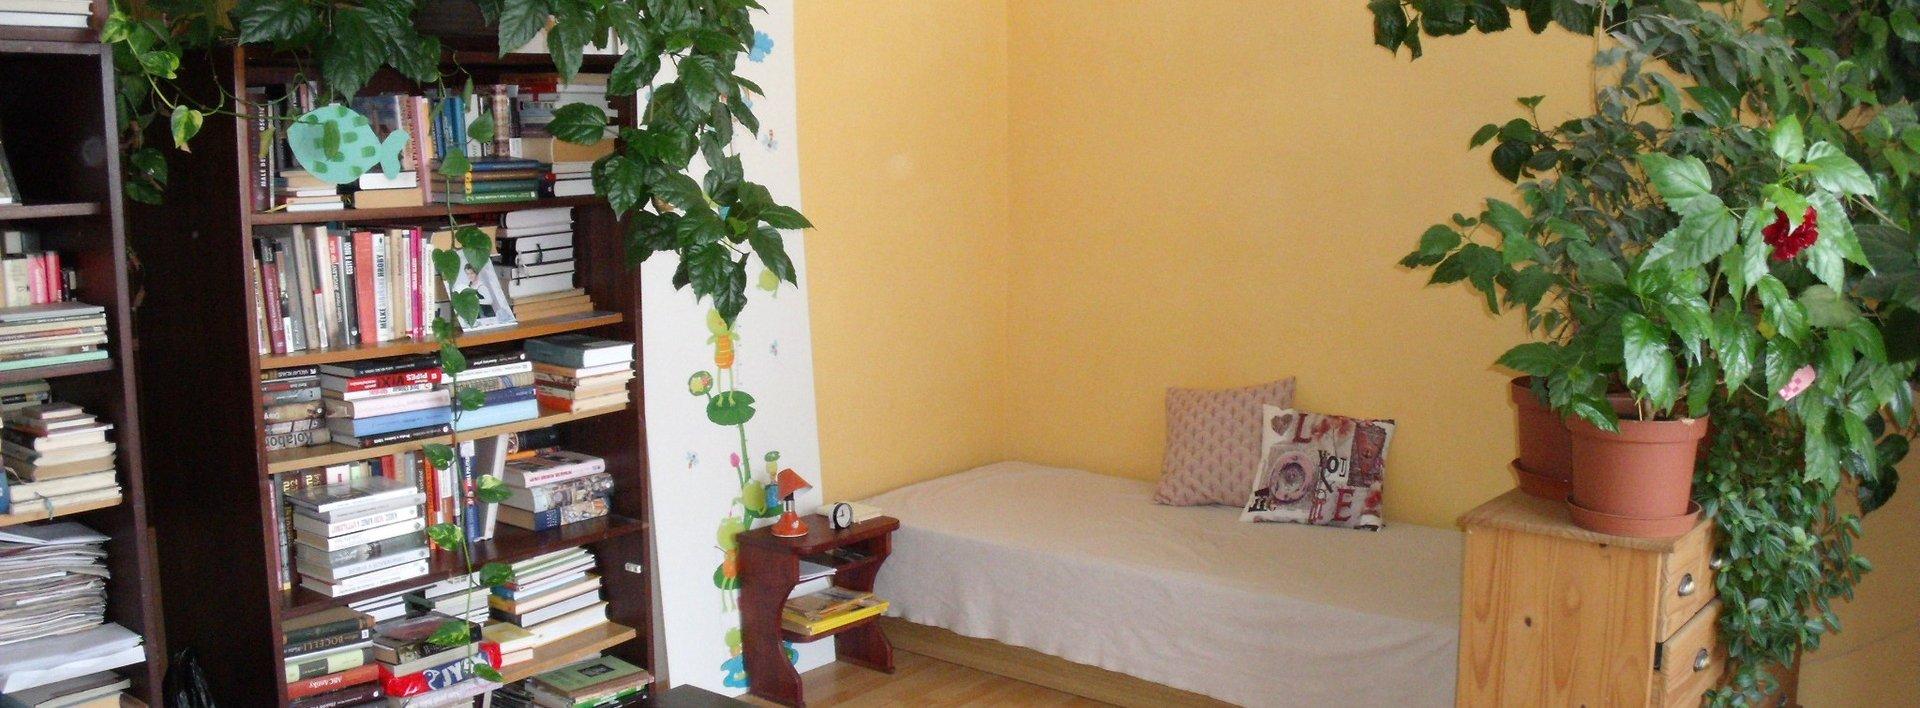 Prodej hezkého, útulného bytu 1+1 v Liberci, ul. Haškova, Ev.č.: N48218